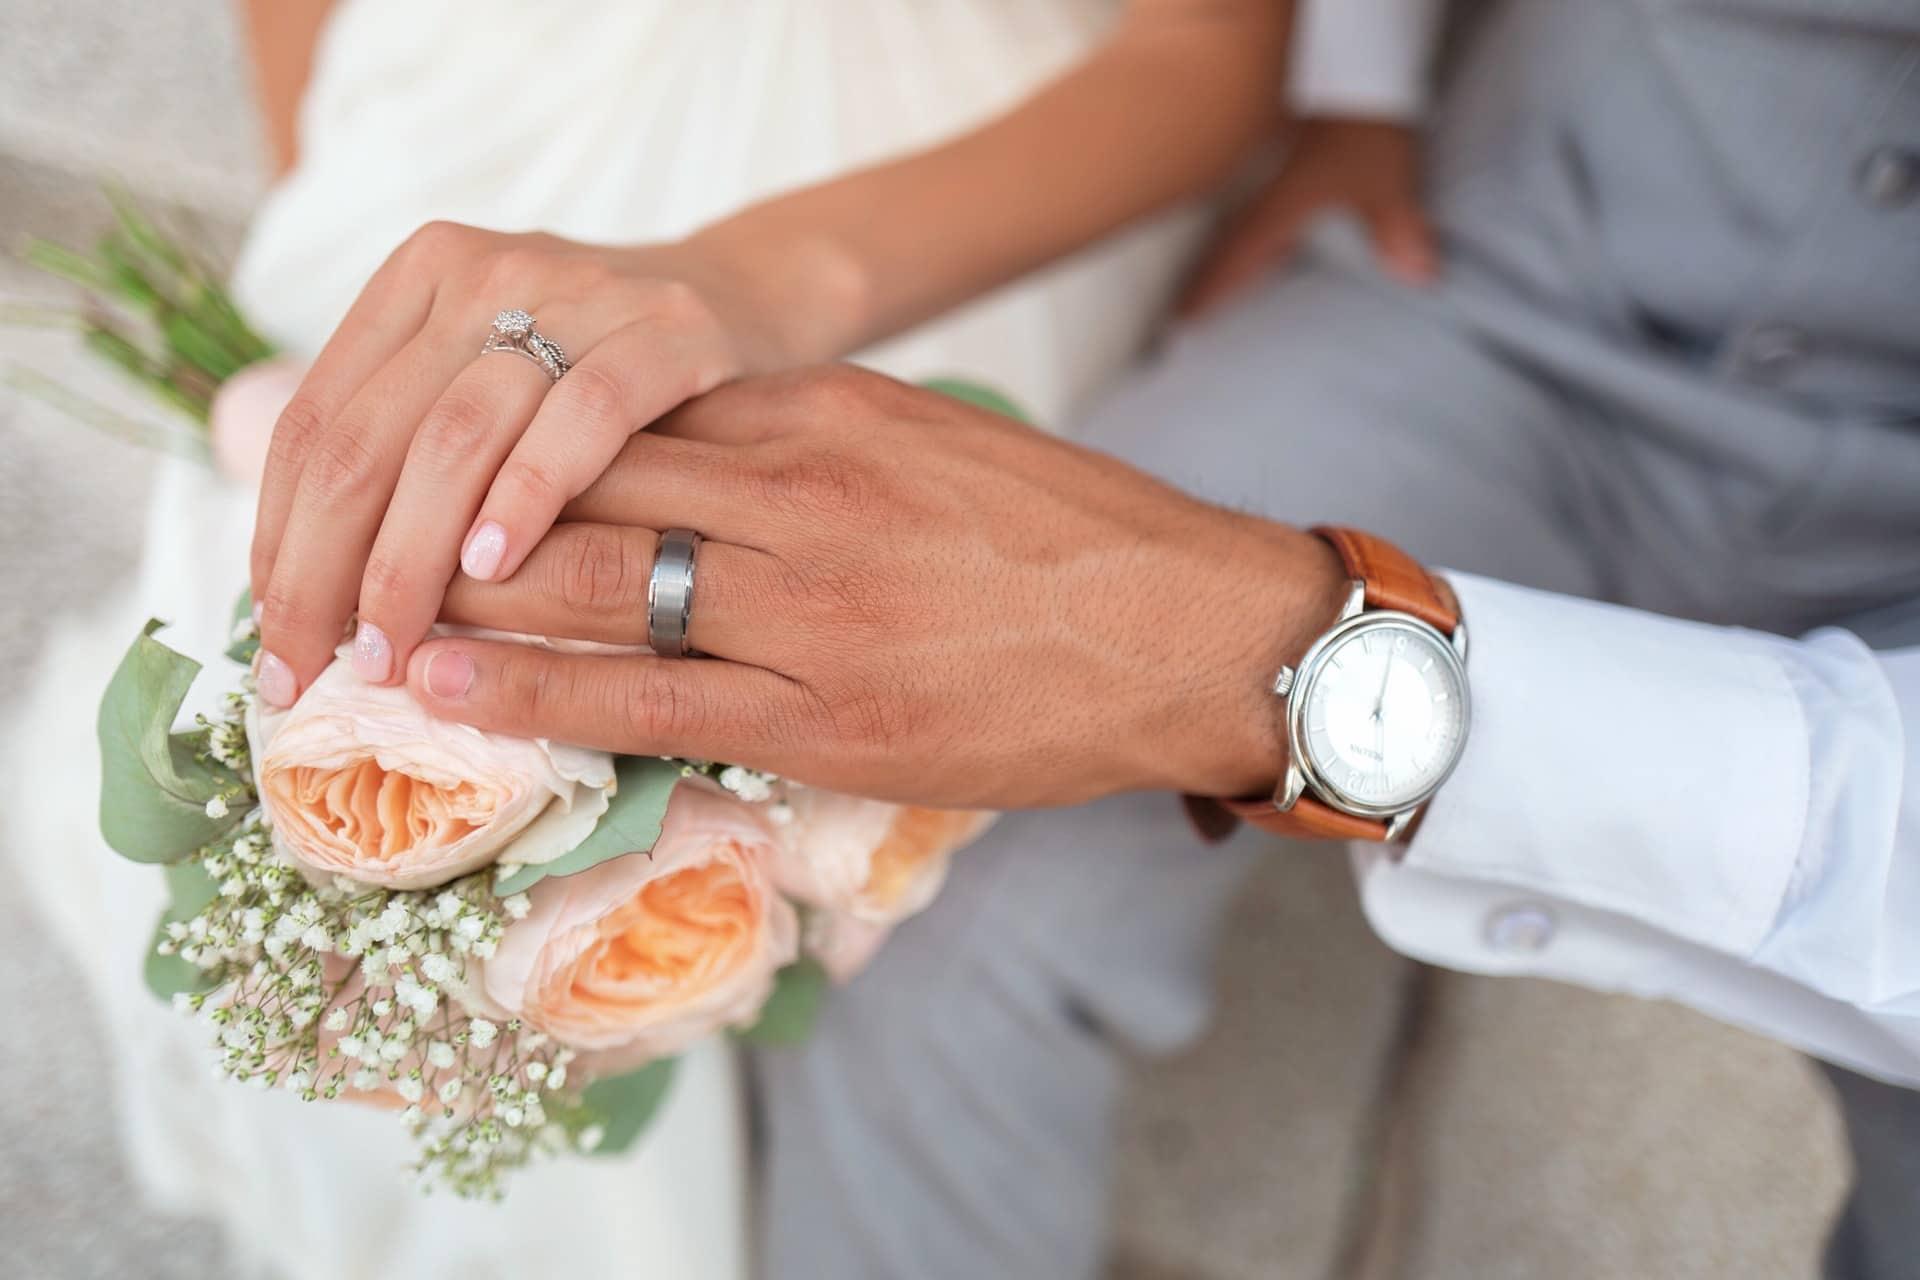 Ilustrasi cincin pernikahan. Photo by Drew Coffman on Unsplash